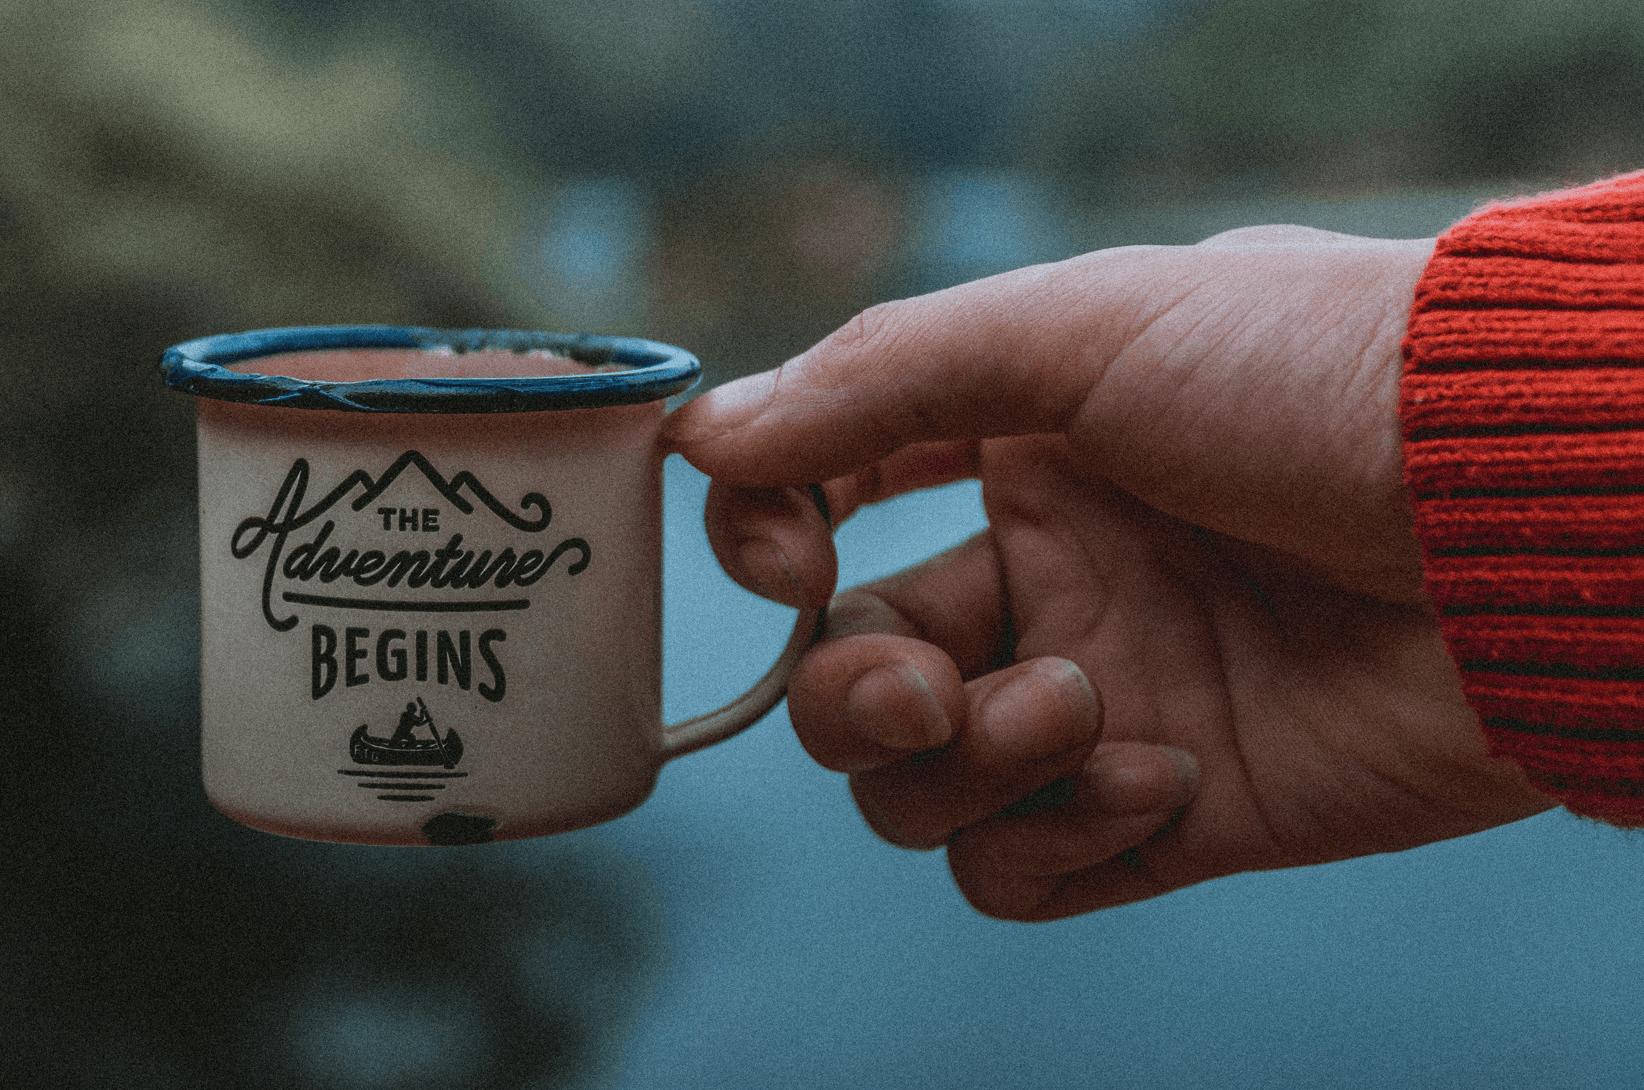 Easy RV recipes: Cowboy coffee